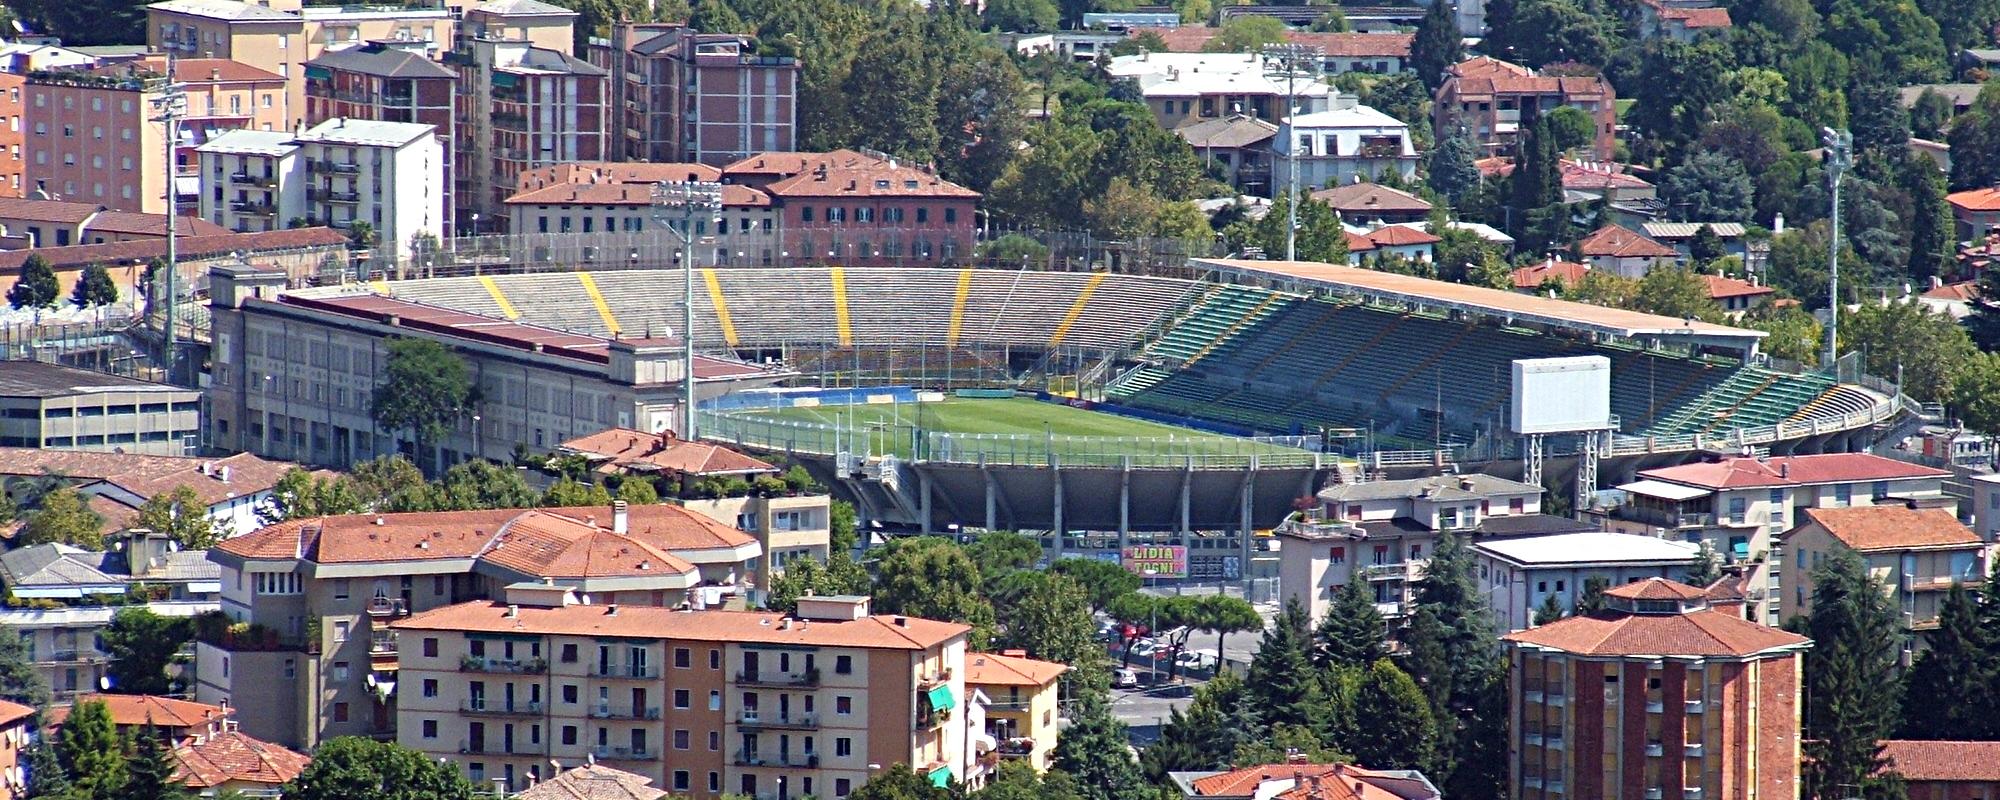 Bergamo Stadion